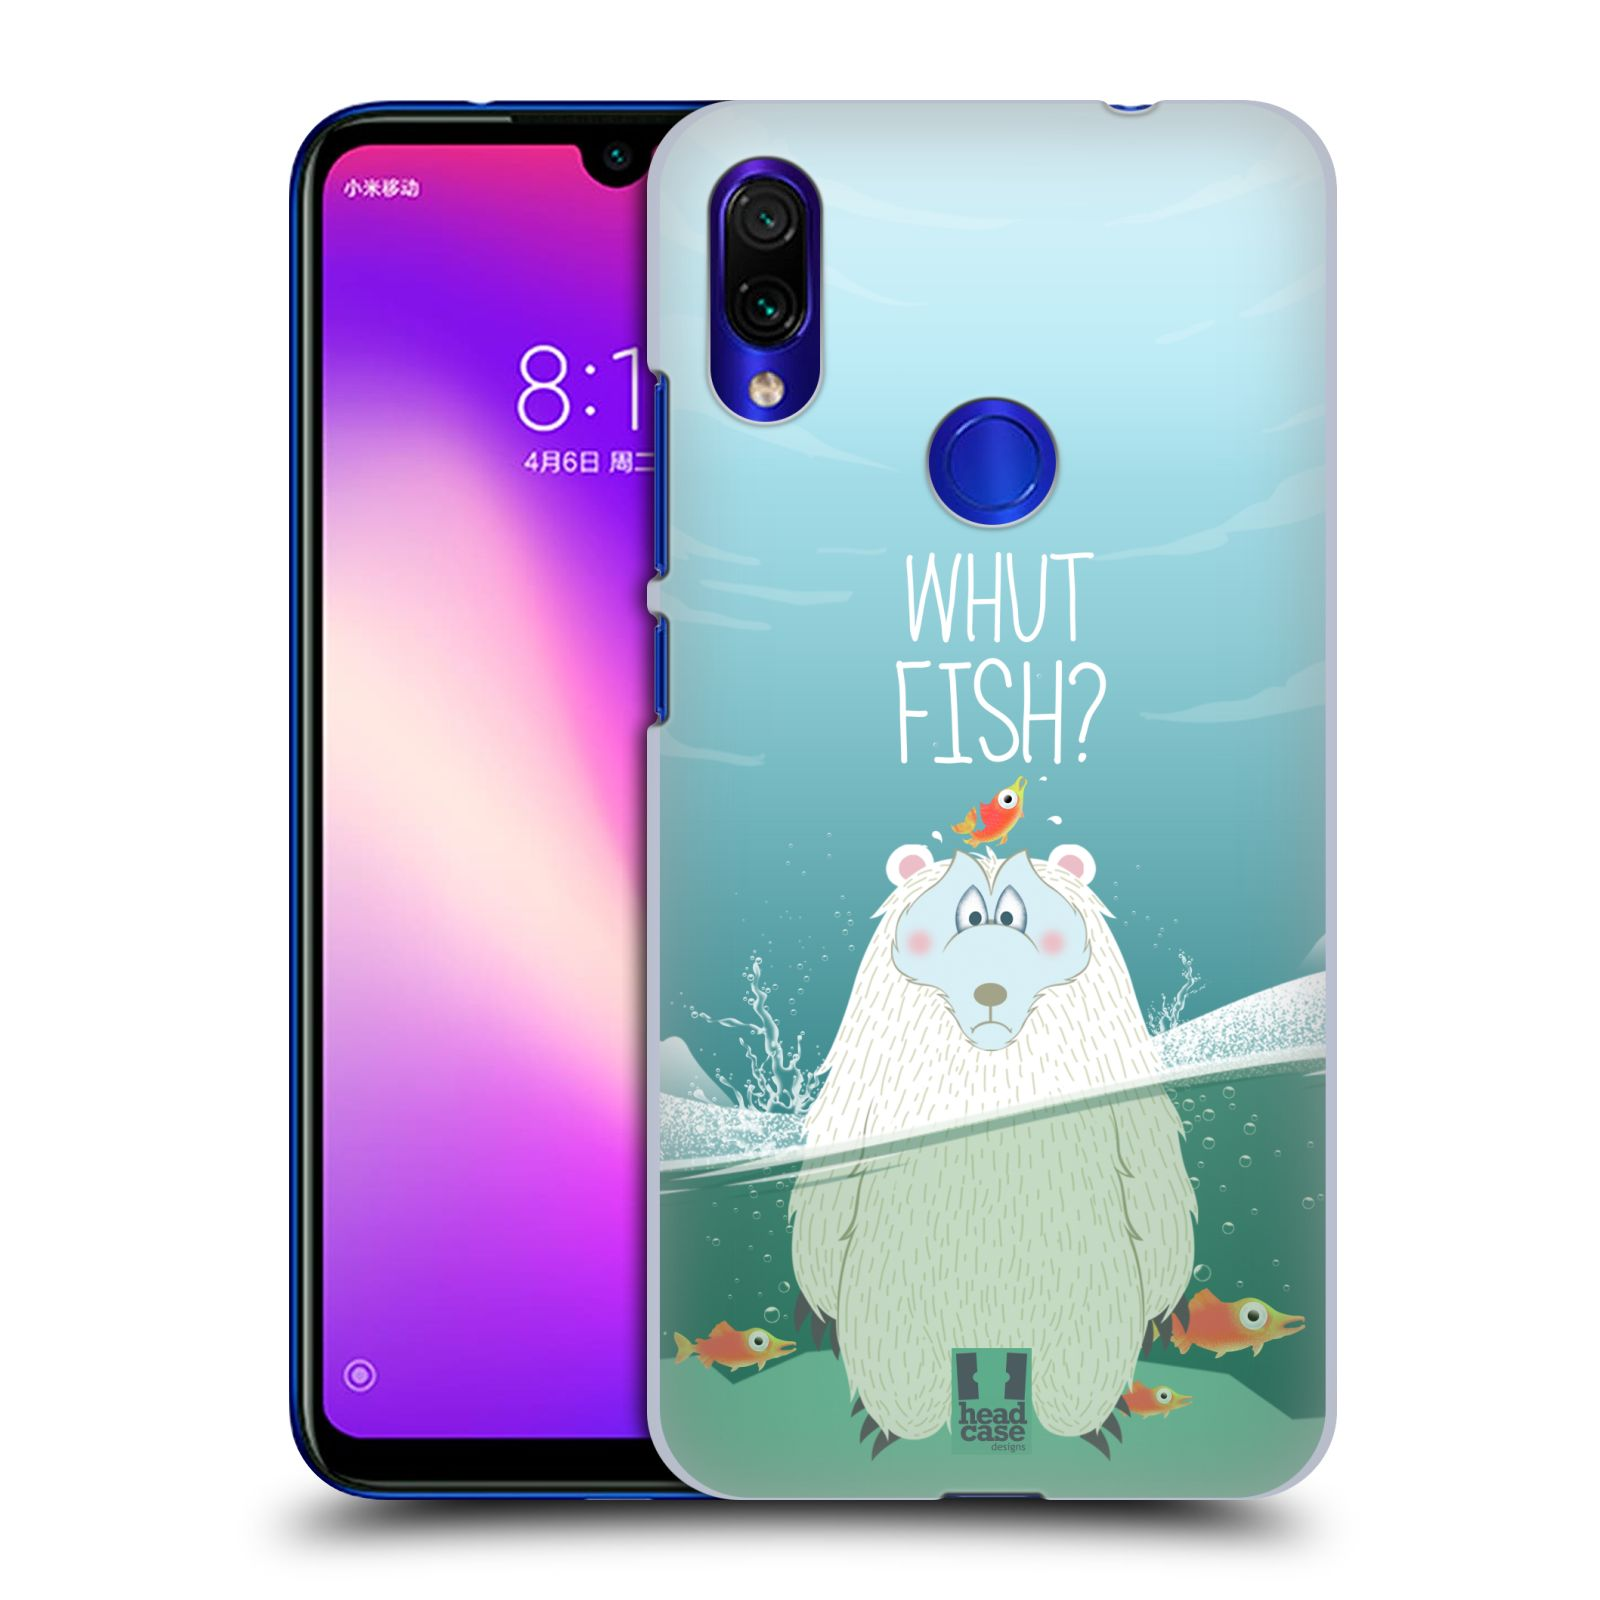 Plastové pouzdro na mobil Xiaomi Redmi Note 7 - Head Case - Medvěd Whut Fish?